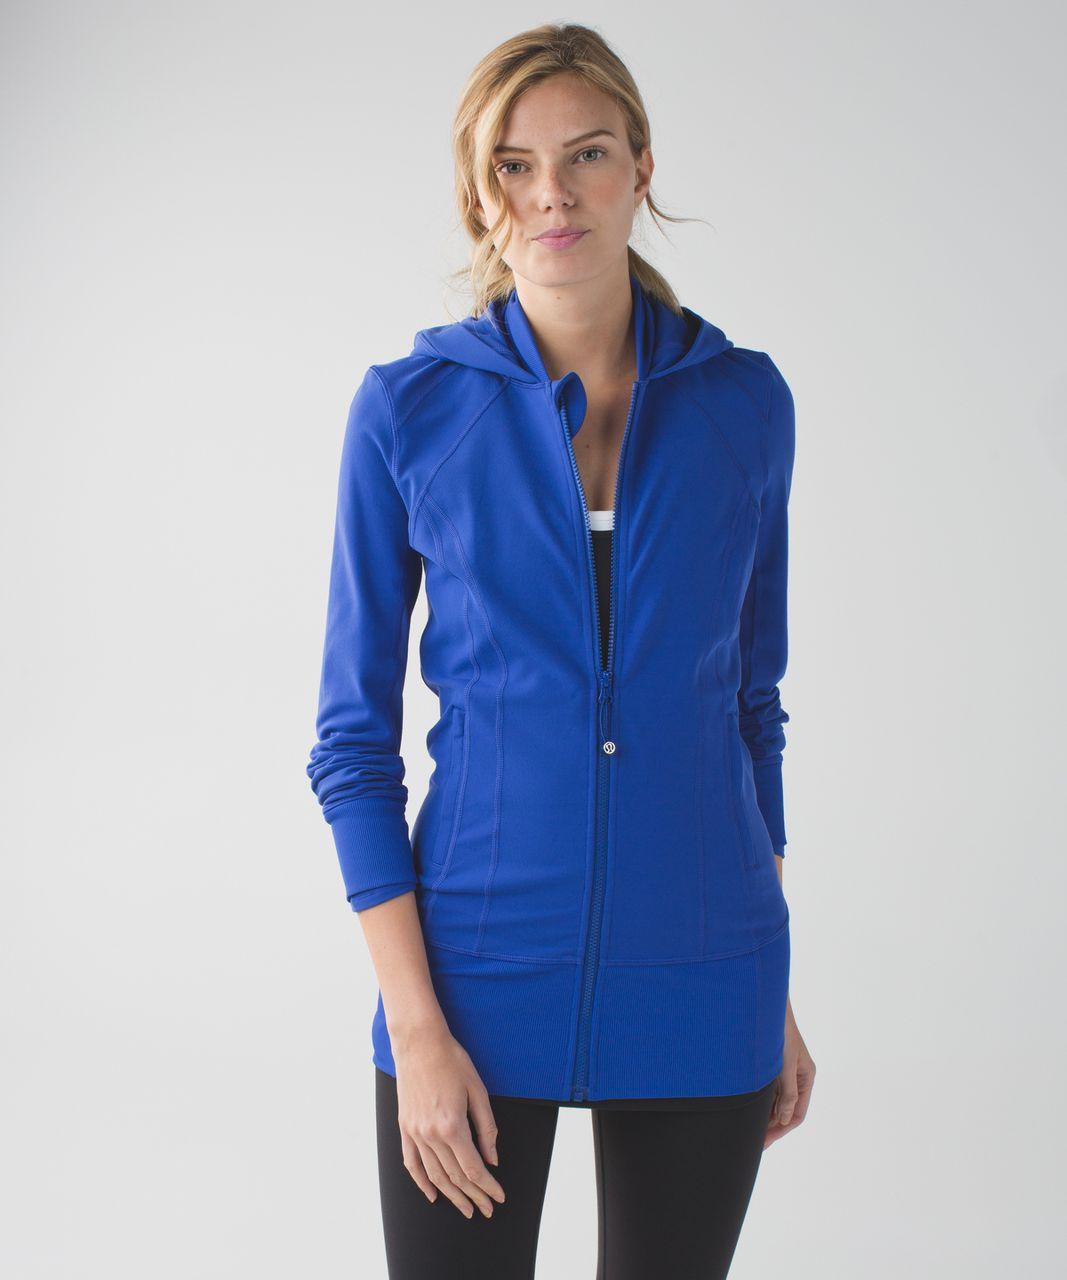 Lululemon Daily Practice Jacket - Sapphire Blue